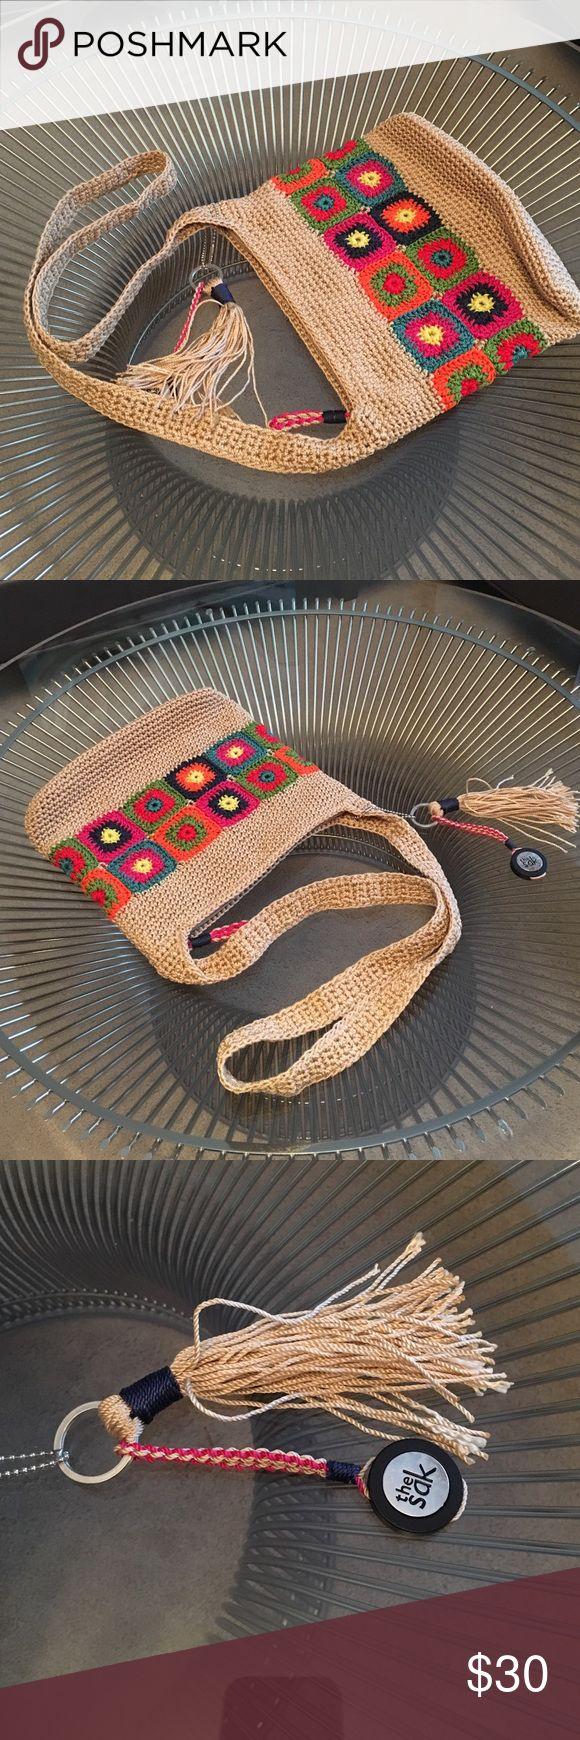 NWOT Sak purse NWOT Sak purse. Beautiful Sak woven purse with zip closure. Comes with matching keyfob. Bag measures 9h x 10l x 1w The Sak Bags